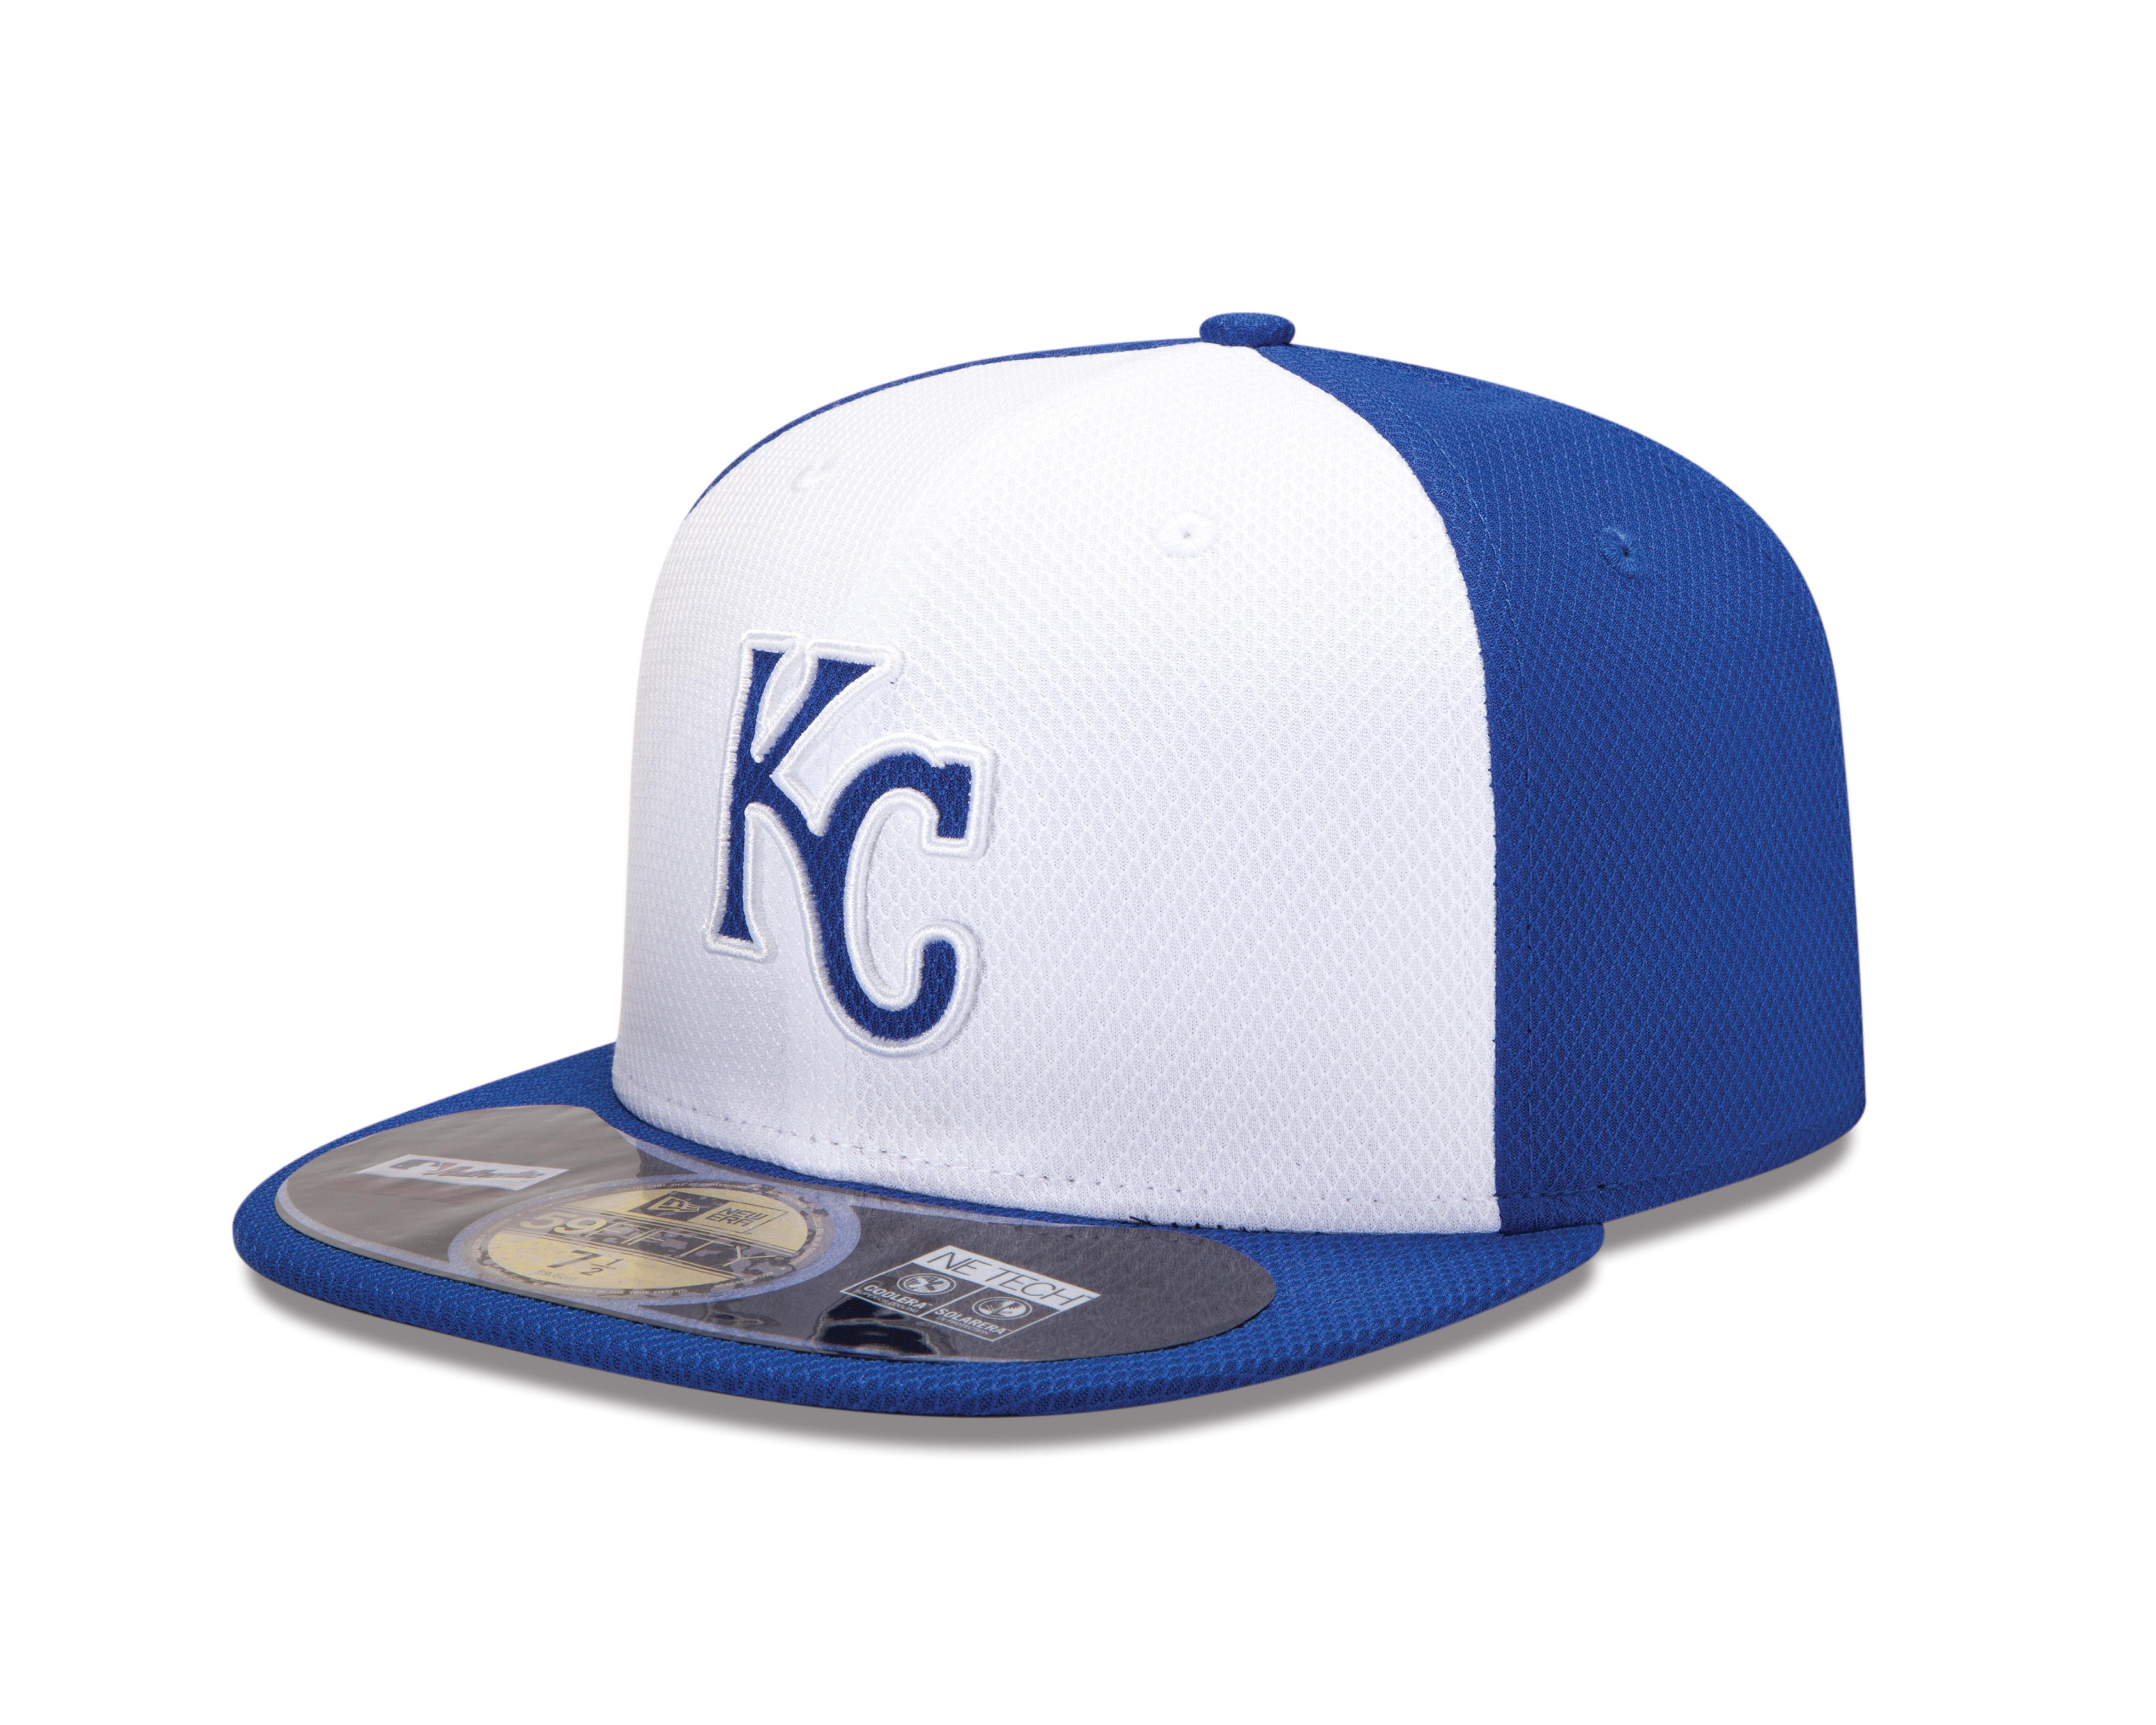 4688x3750 Royals Baseball Clipart